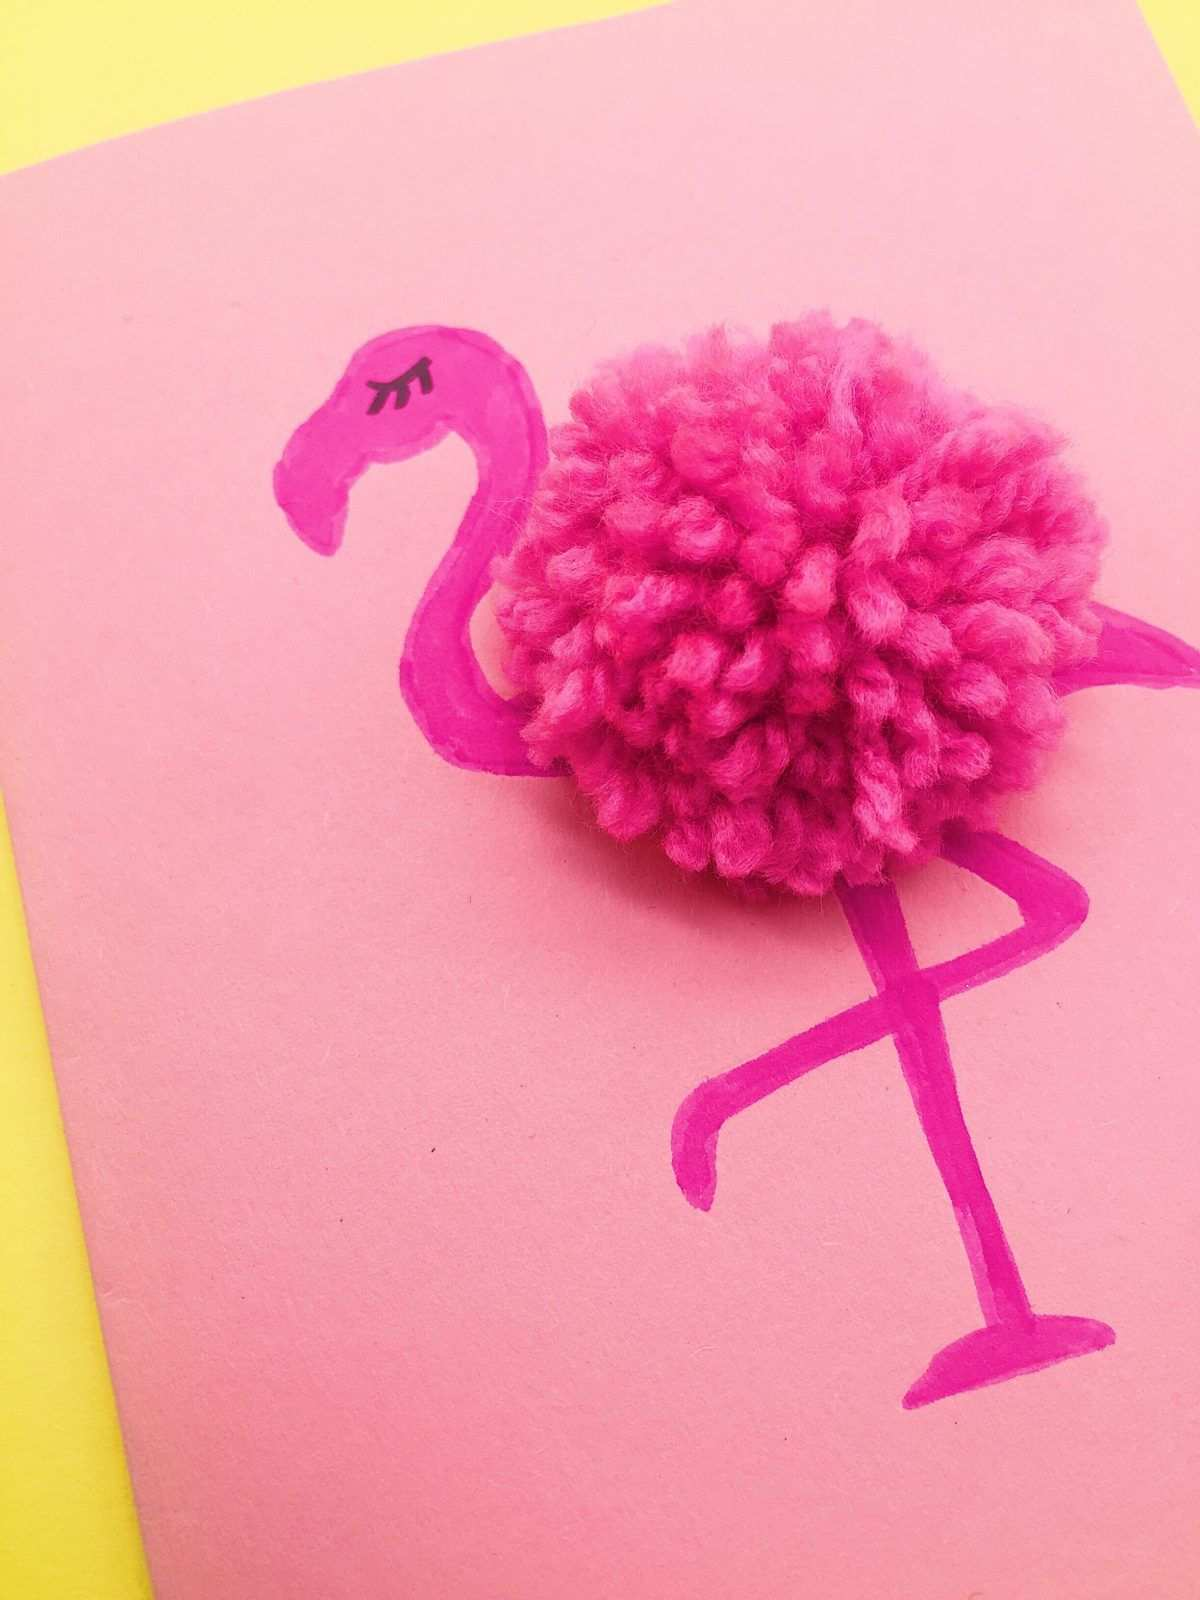 Drei Einfache Bastelideen Mit Flamingos Bastelideen Flamingo Geburtstag Basteln